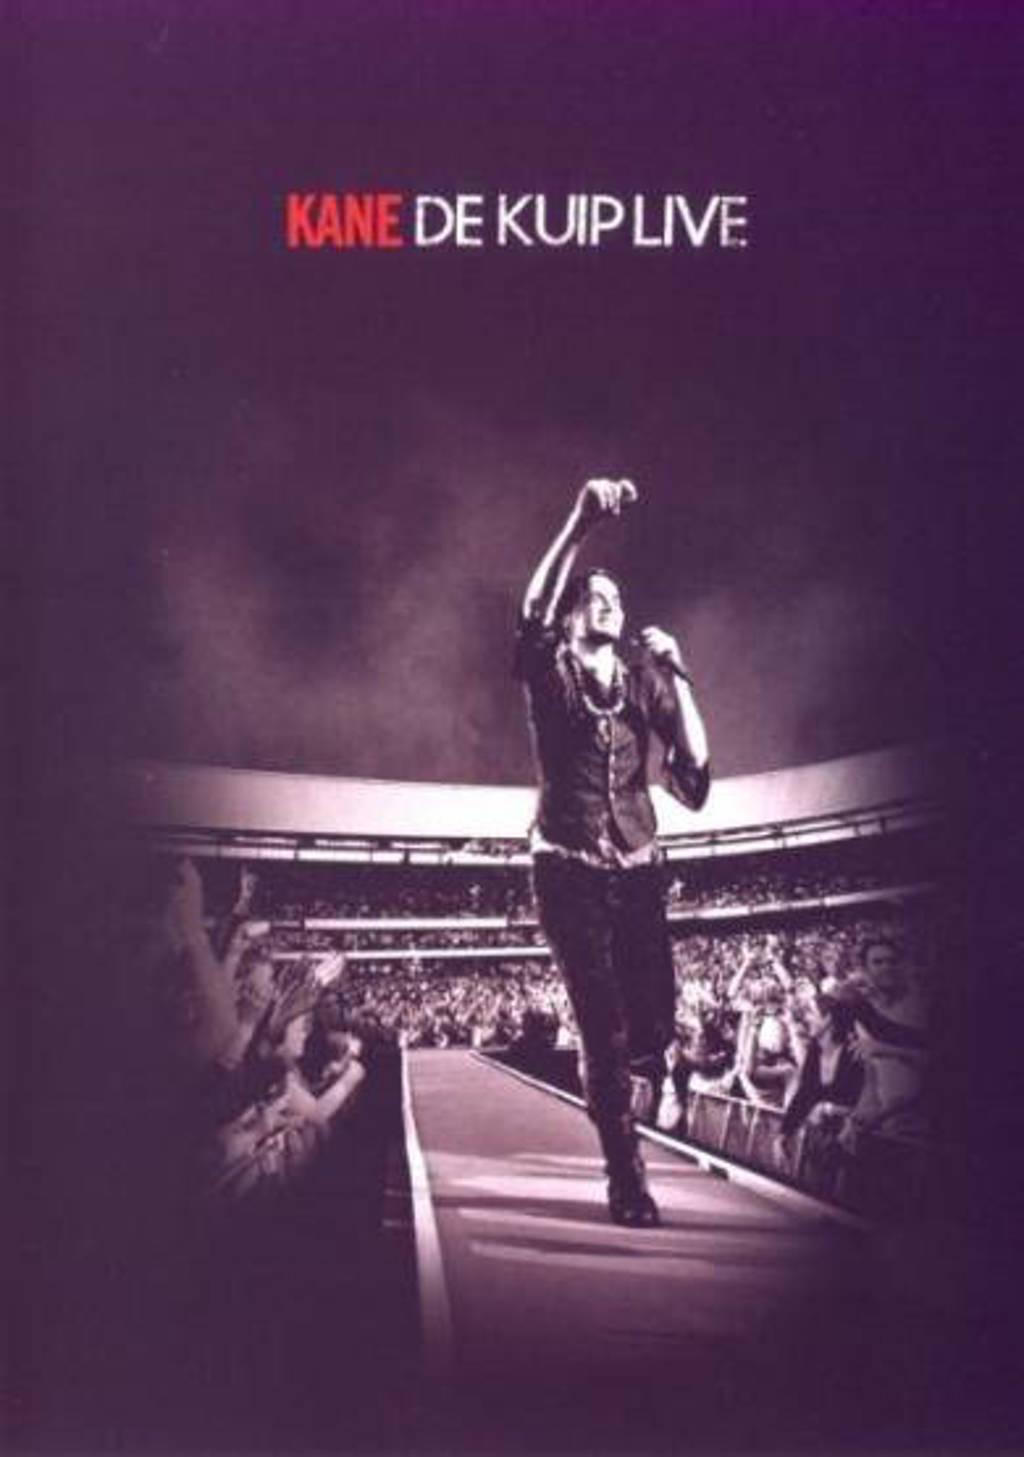 Kane - De Kuip live (DVD)